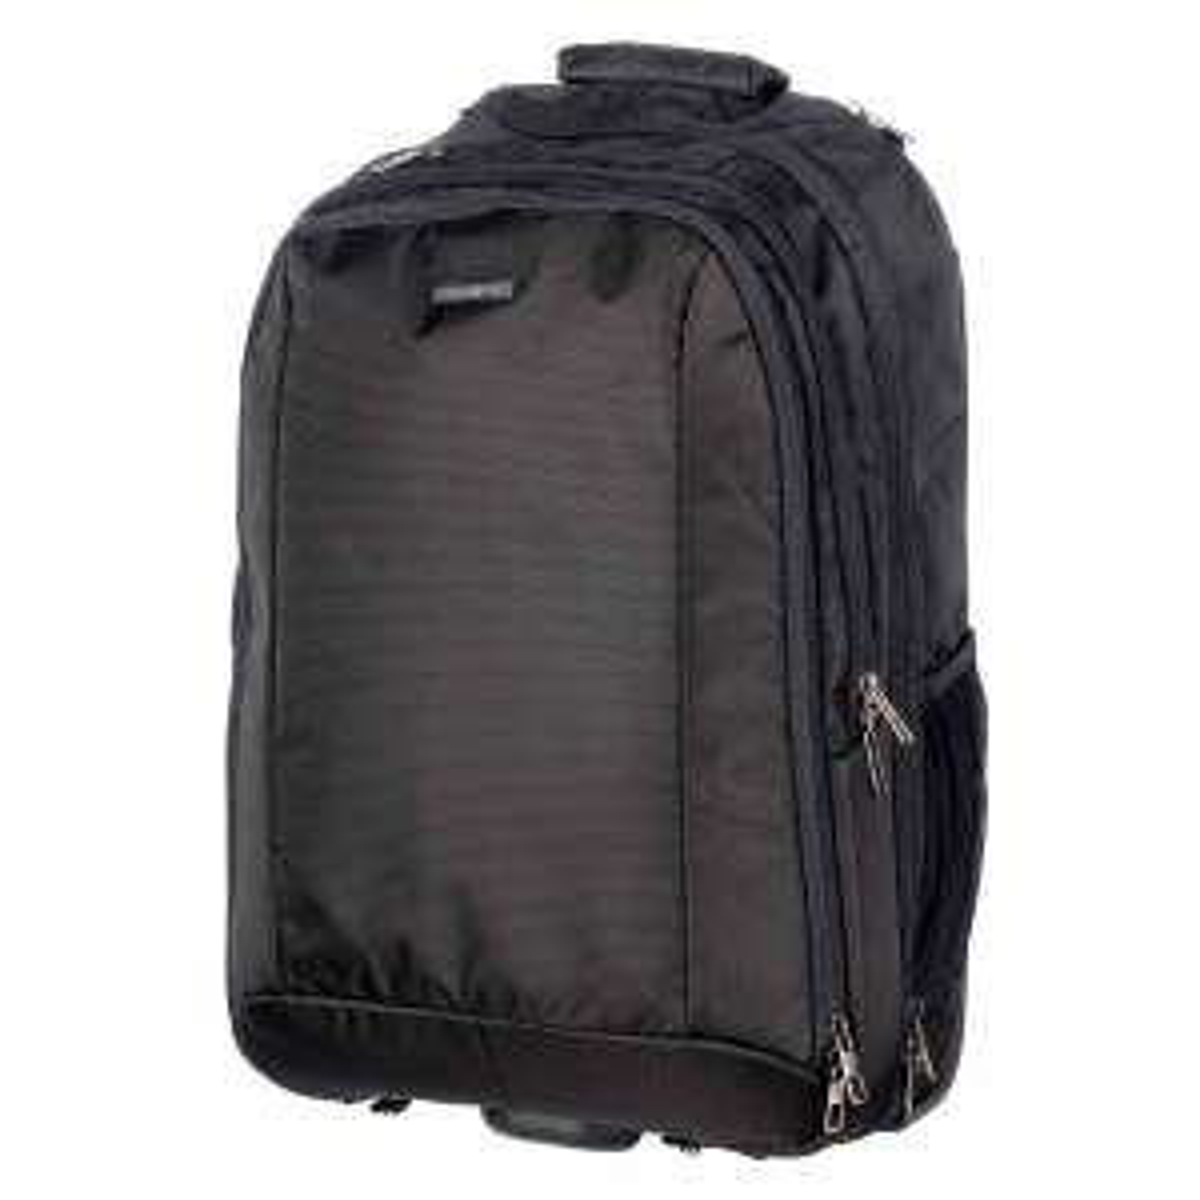 Samsonite laptop backpack with wheels £38.94 delivered @ Rymans